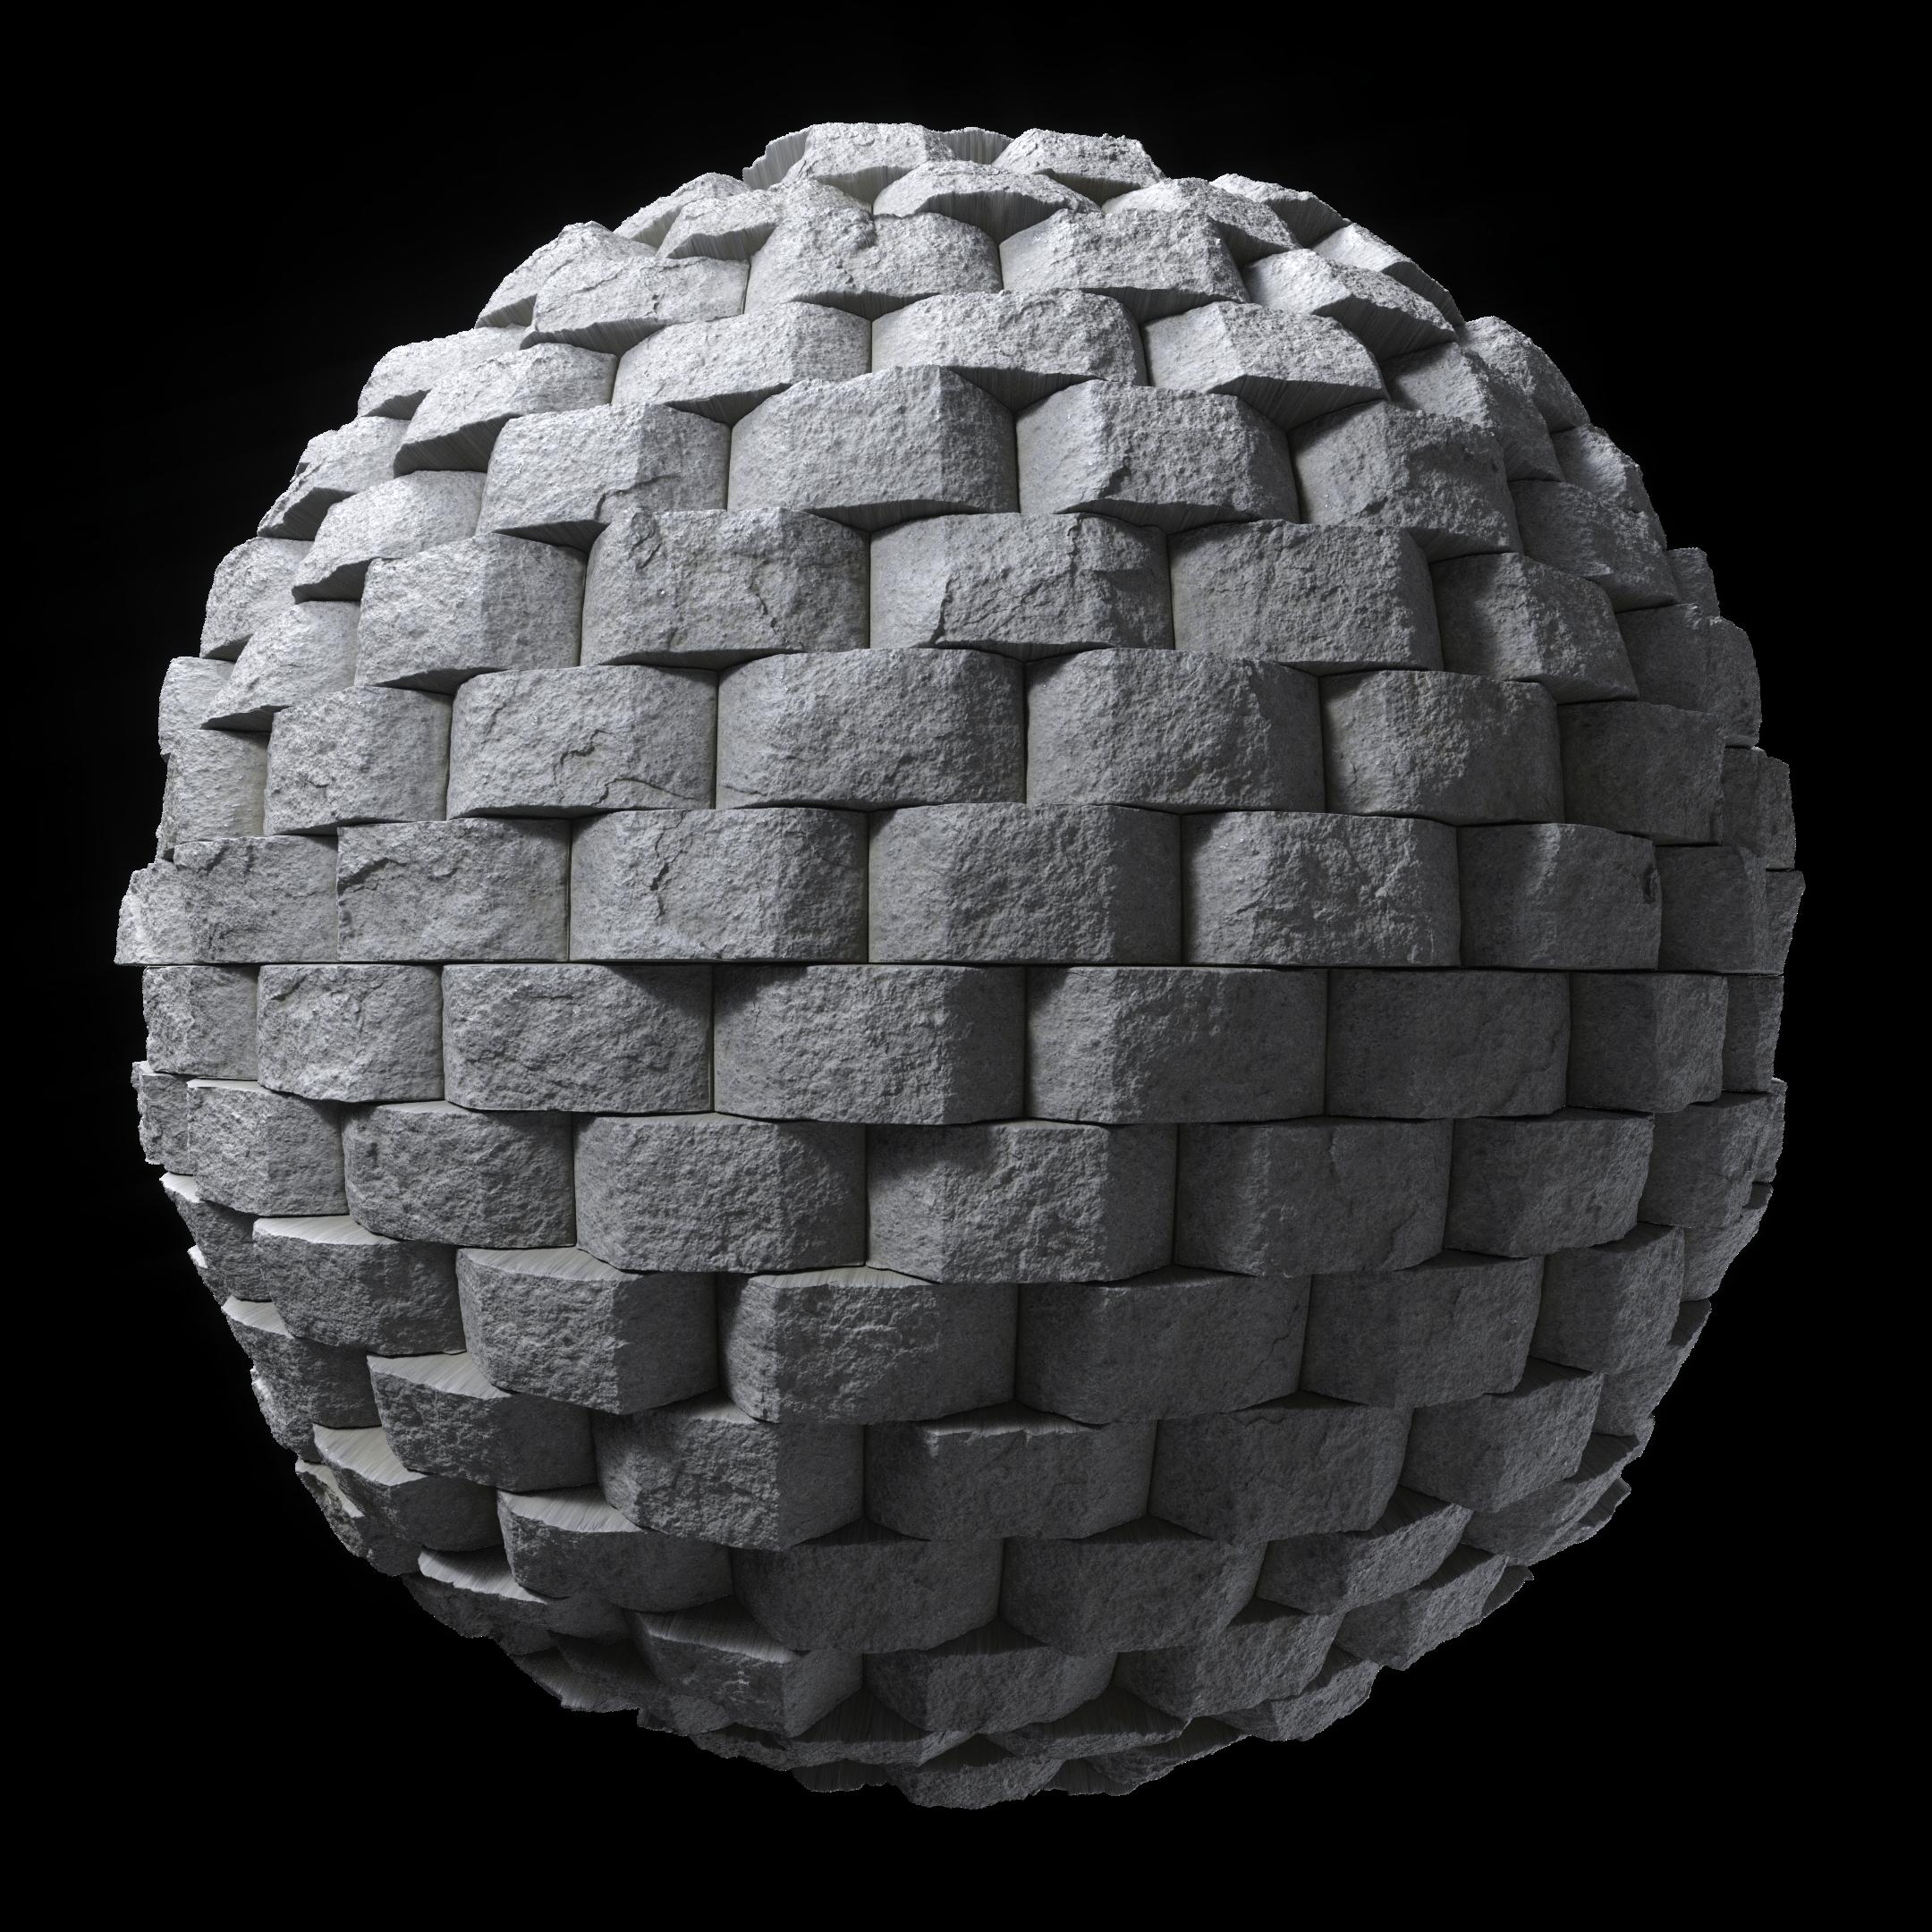 Tcom_Brick_StoneGeometric_thumb1.png